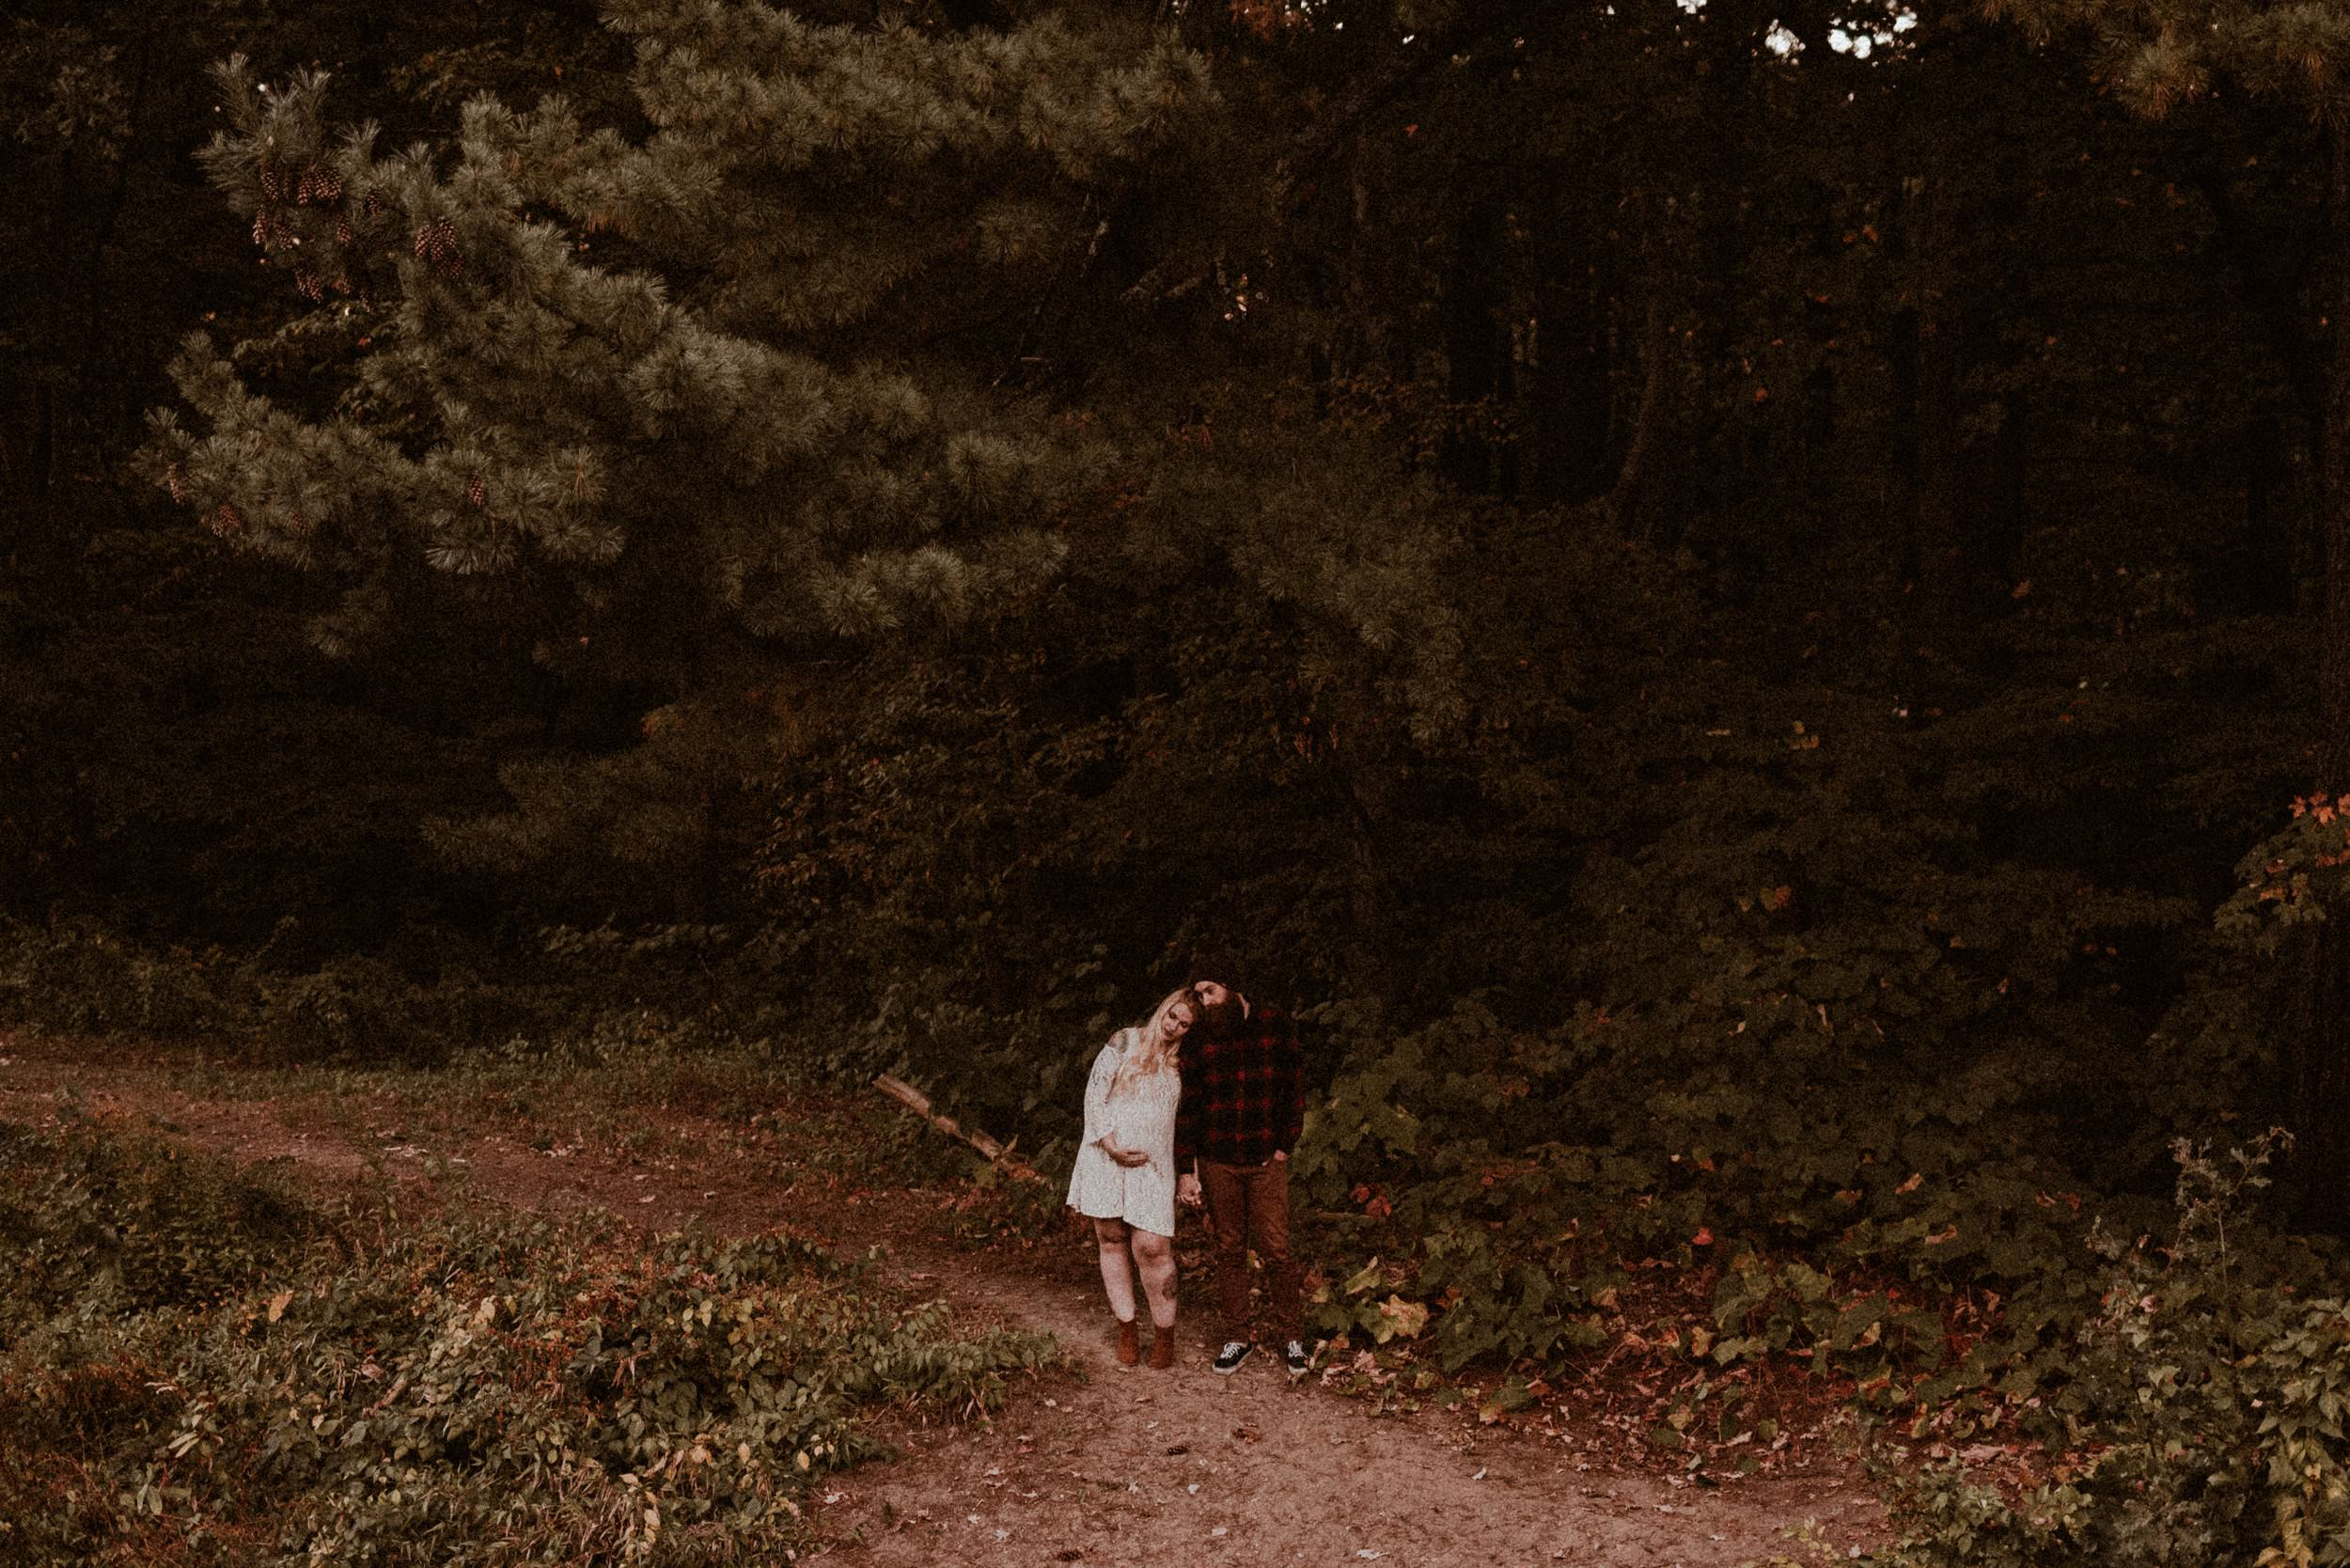 whimsical maternity session - vanessa alves photography - new england wedding photographers 13.jpg